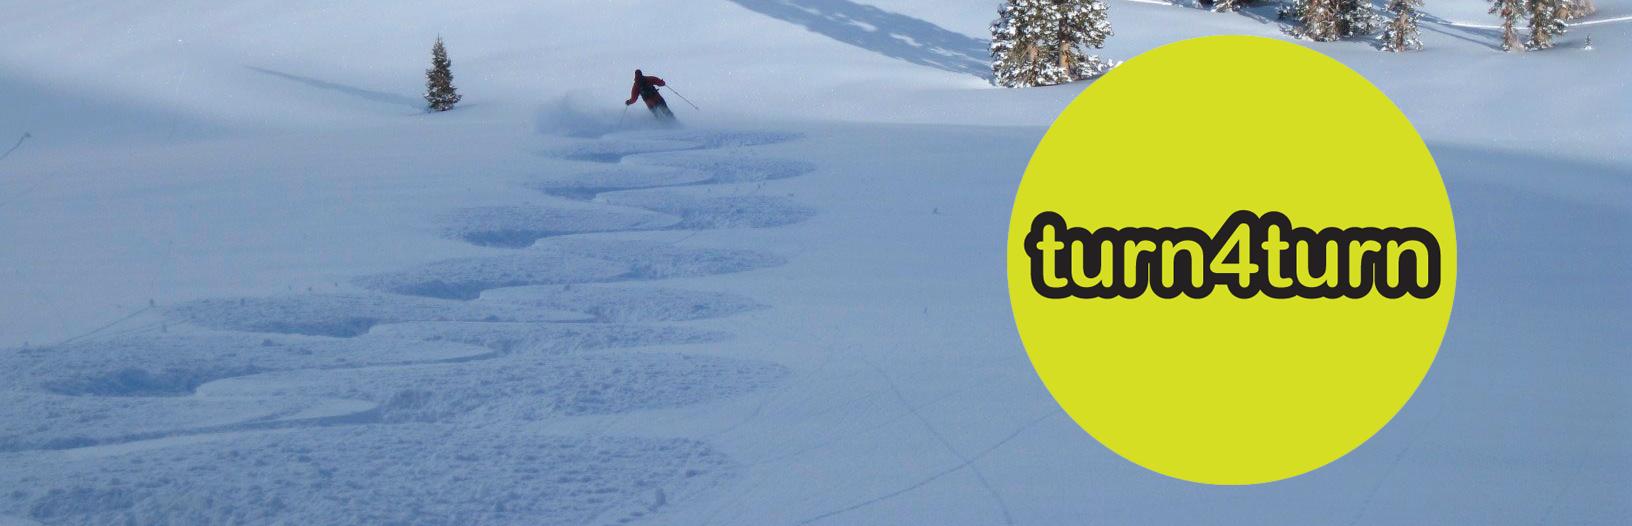 turn4turn-logo.jpg